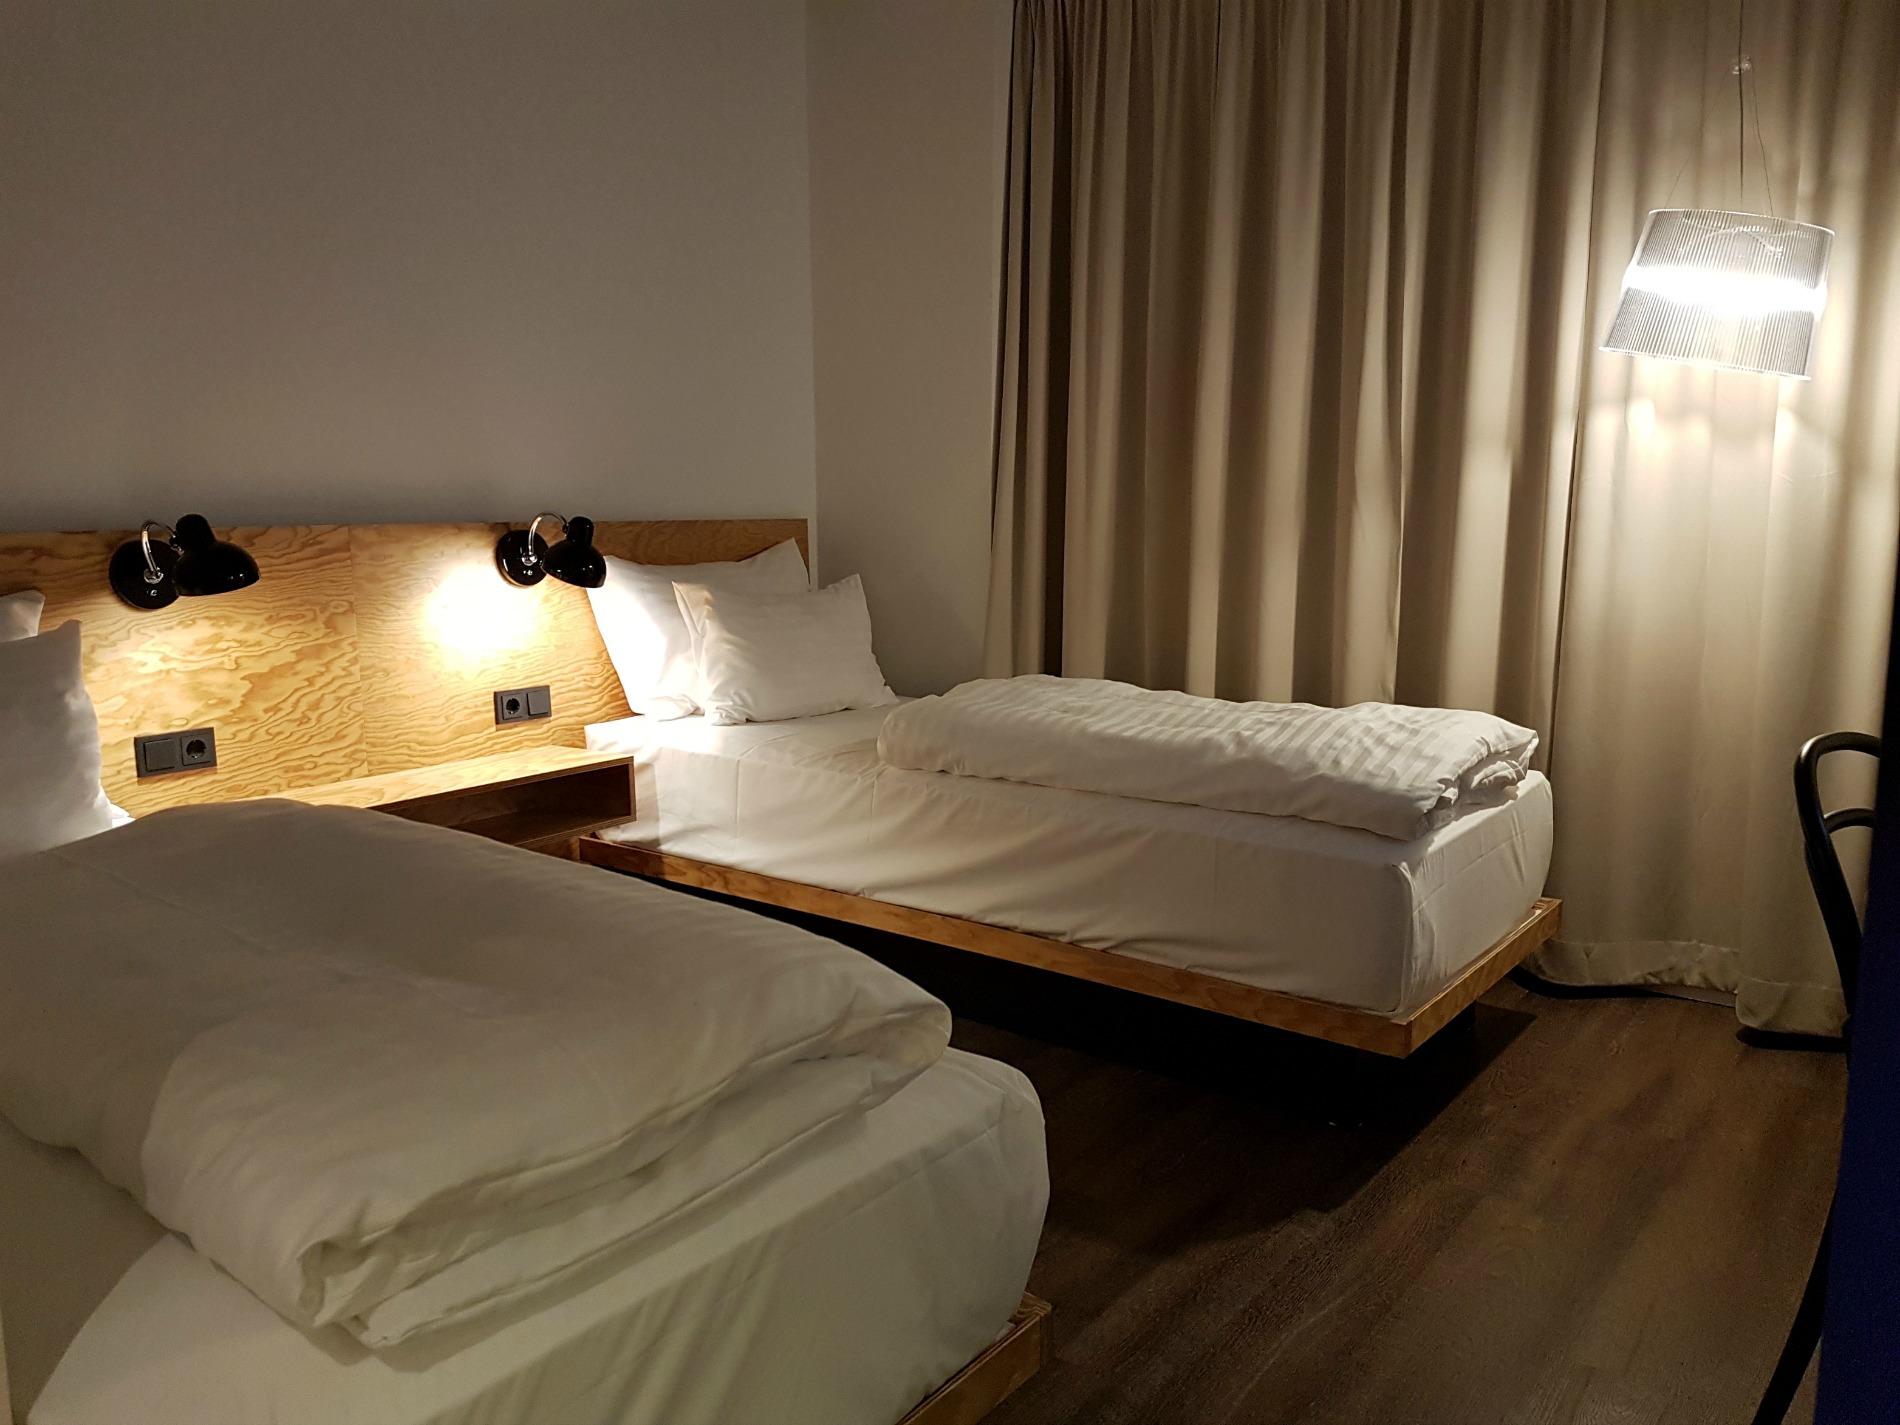 hotel-schani-wien-accessible-room-twin-beds